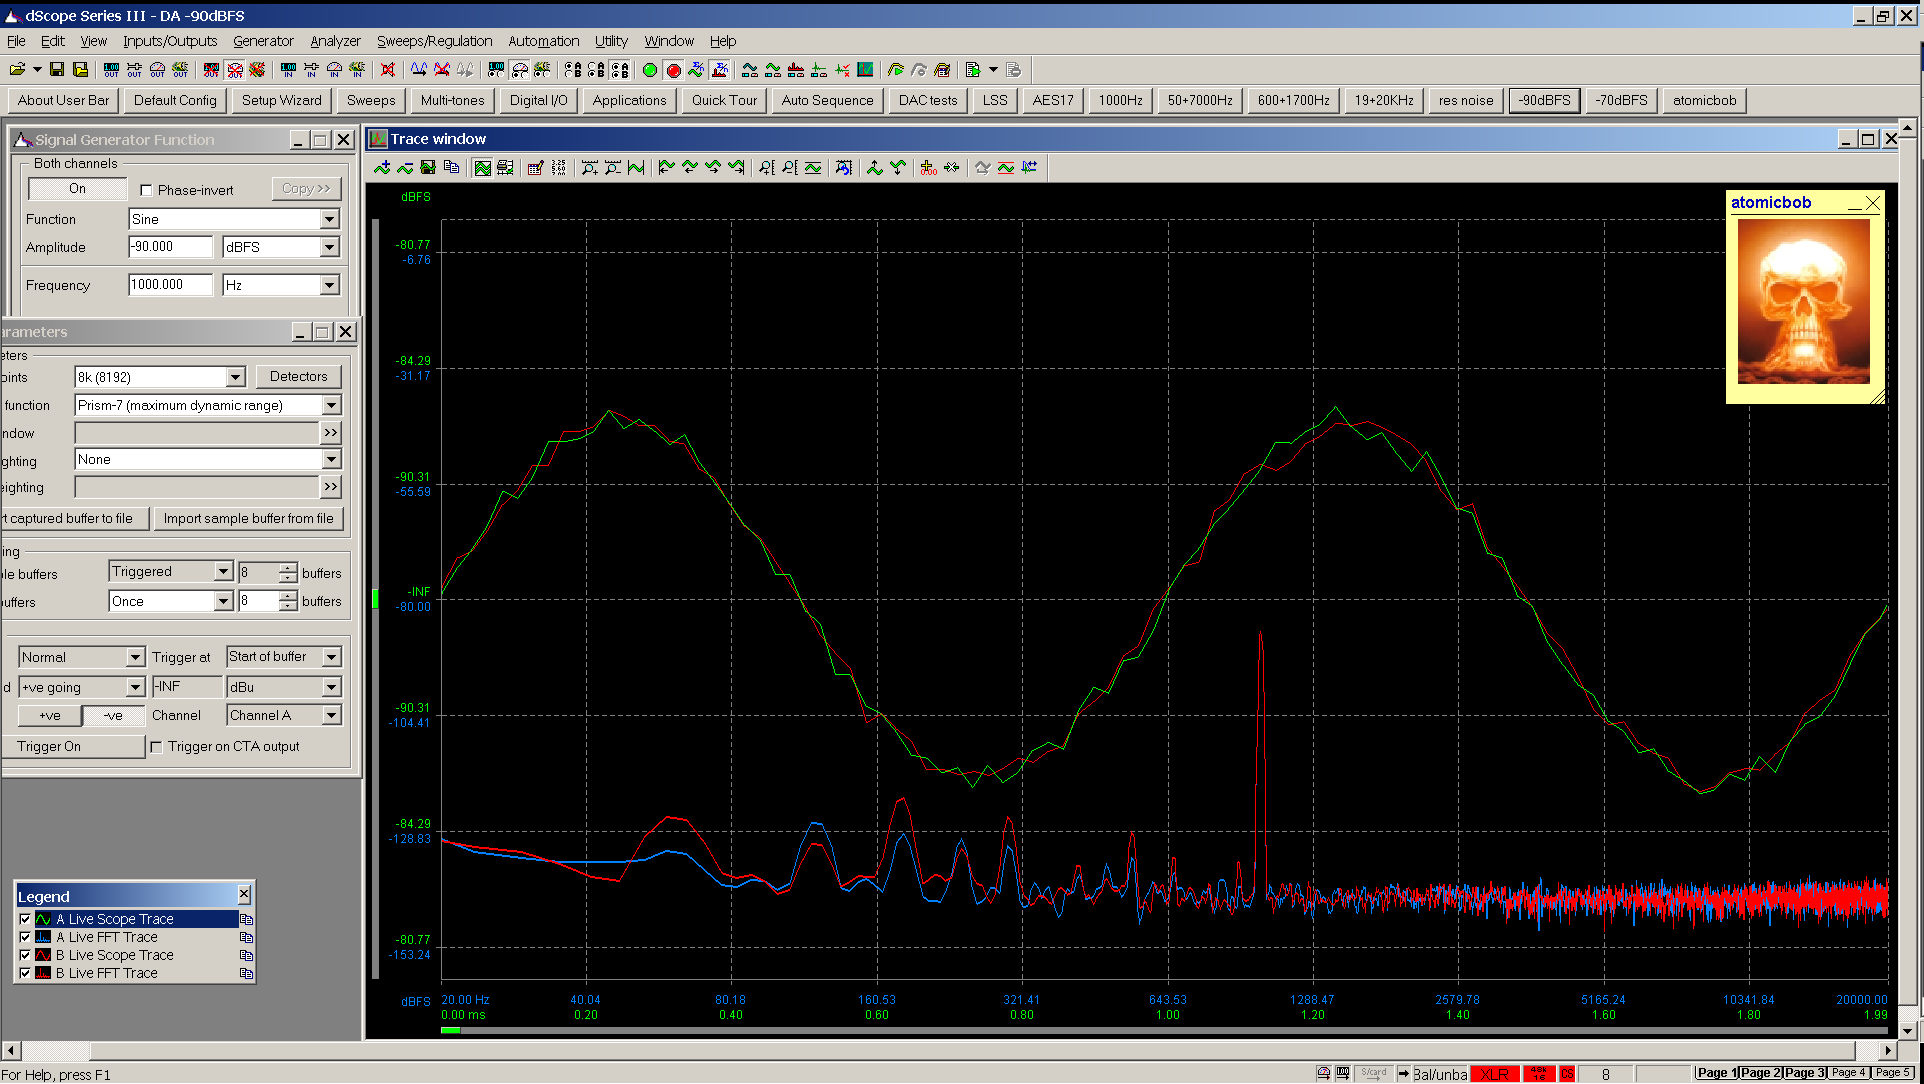 20190323-18 solaris Bal 1 KHz -90 dBFS - AES.PNG